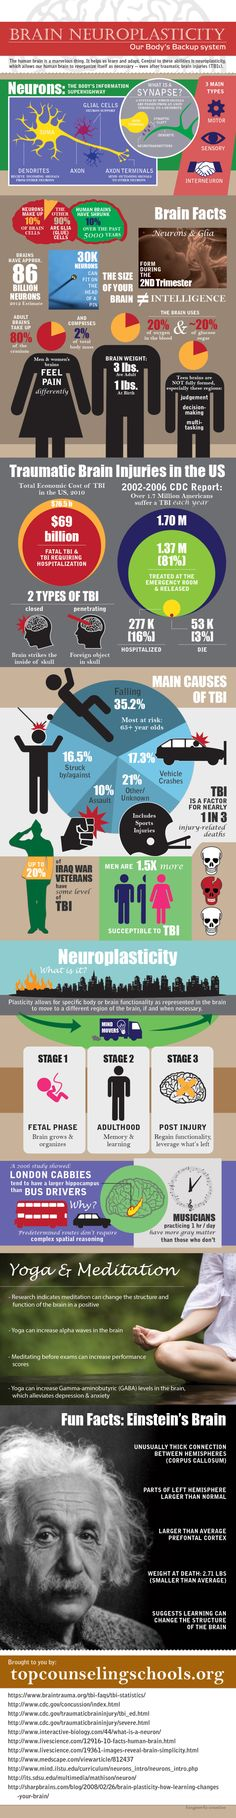 neuroplasticity_900